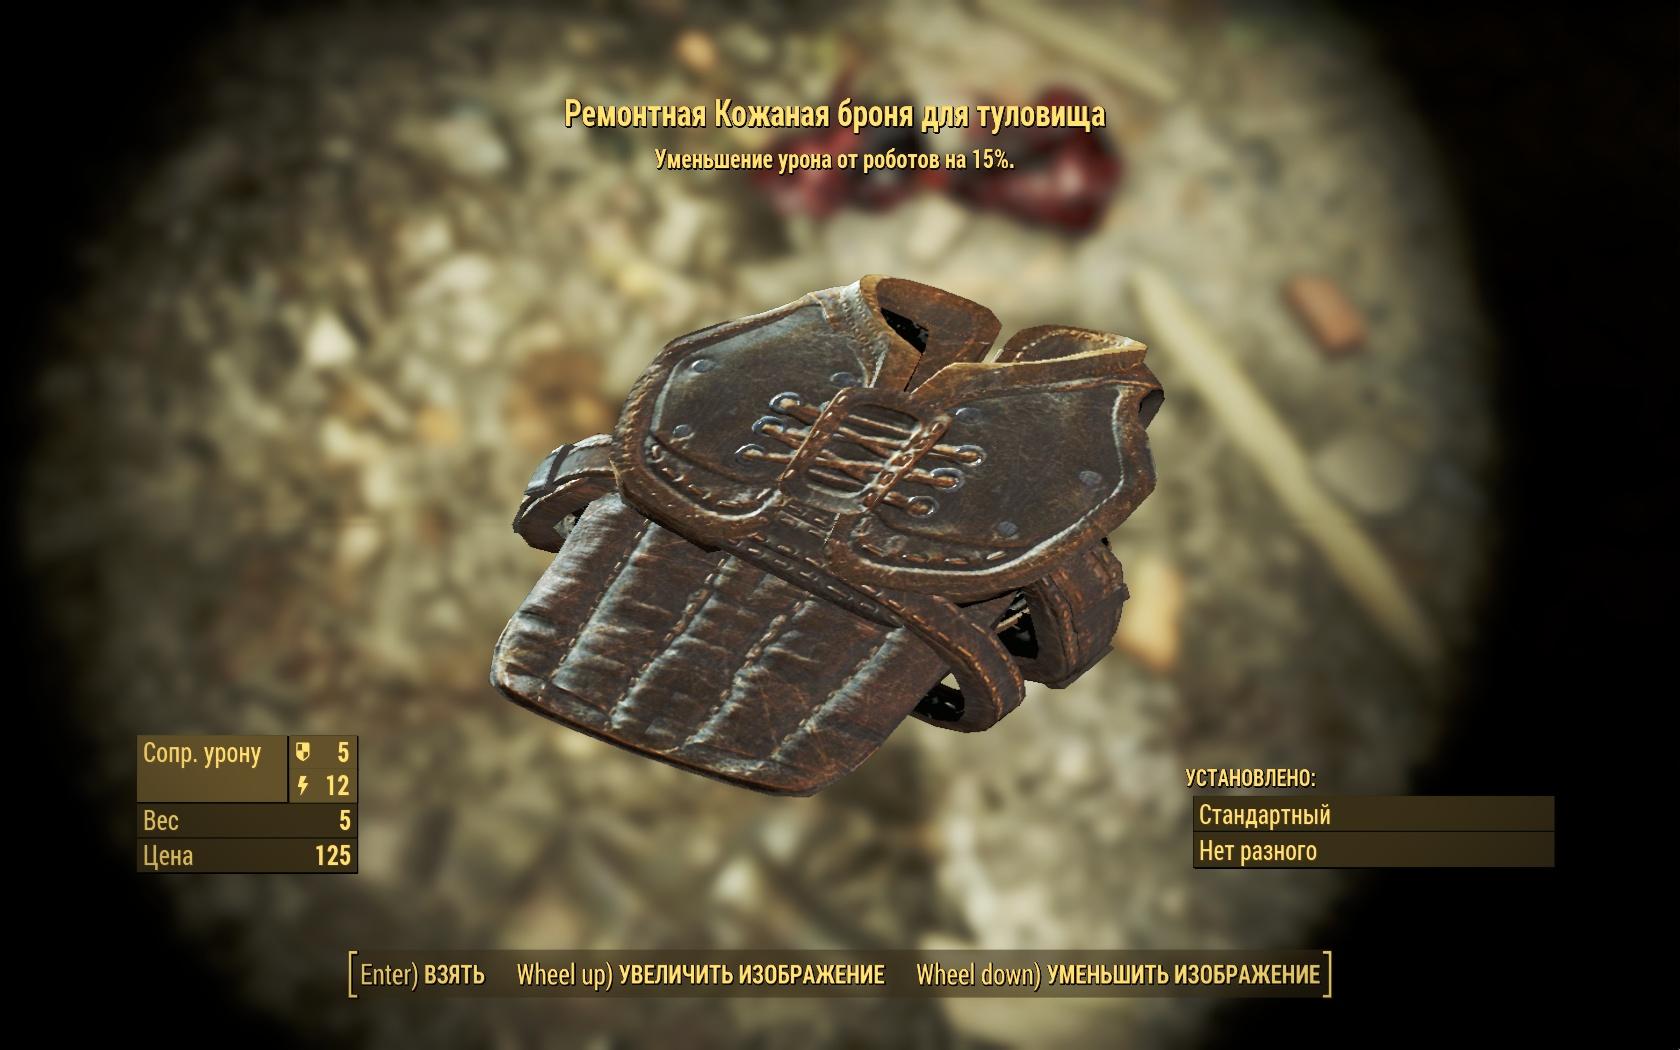 Ремонтная кожаная броня для туловища - Fallout 4 броня, кожаная, Одежда, Ремонтная